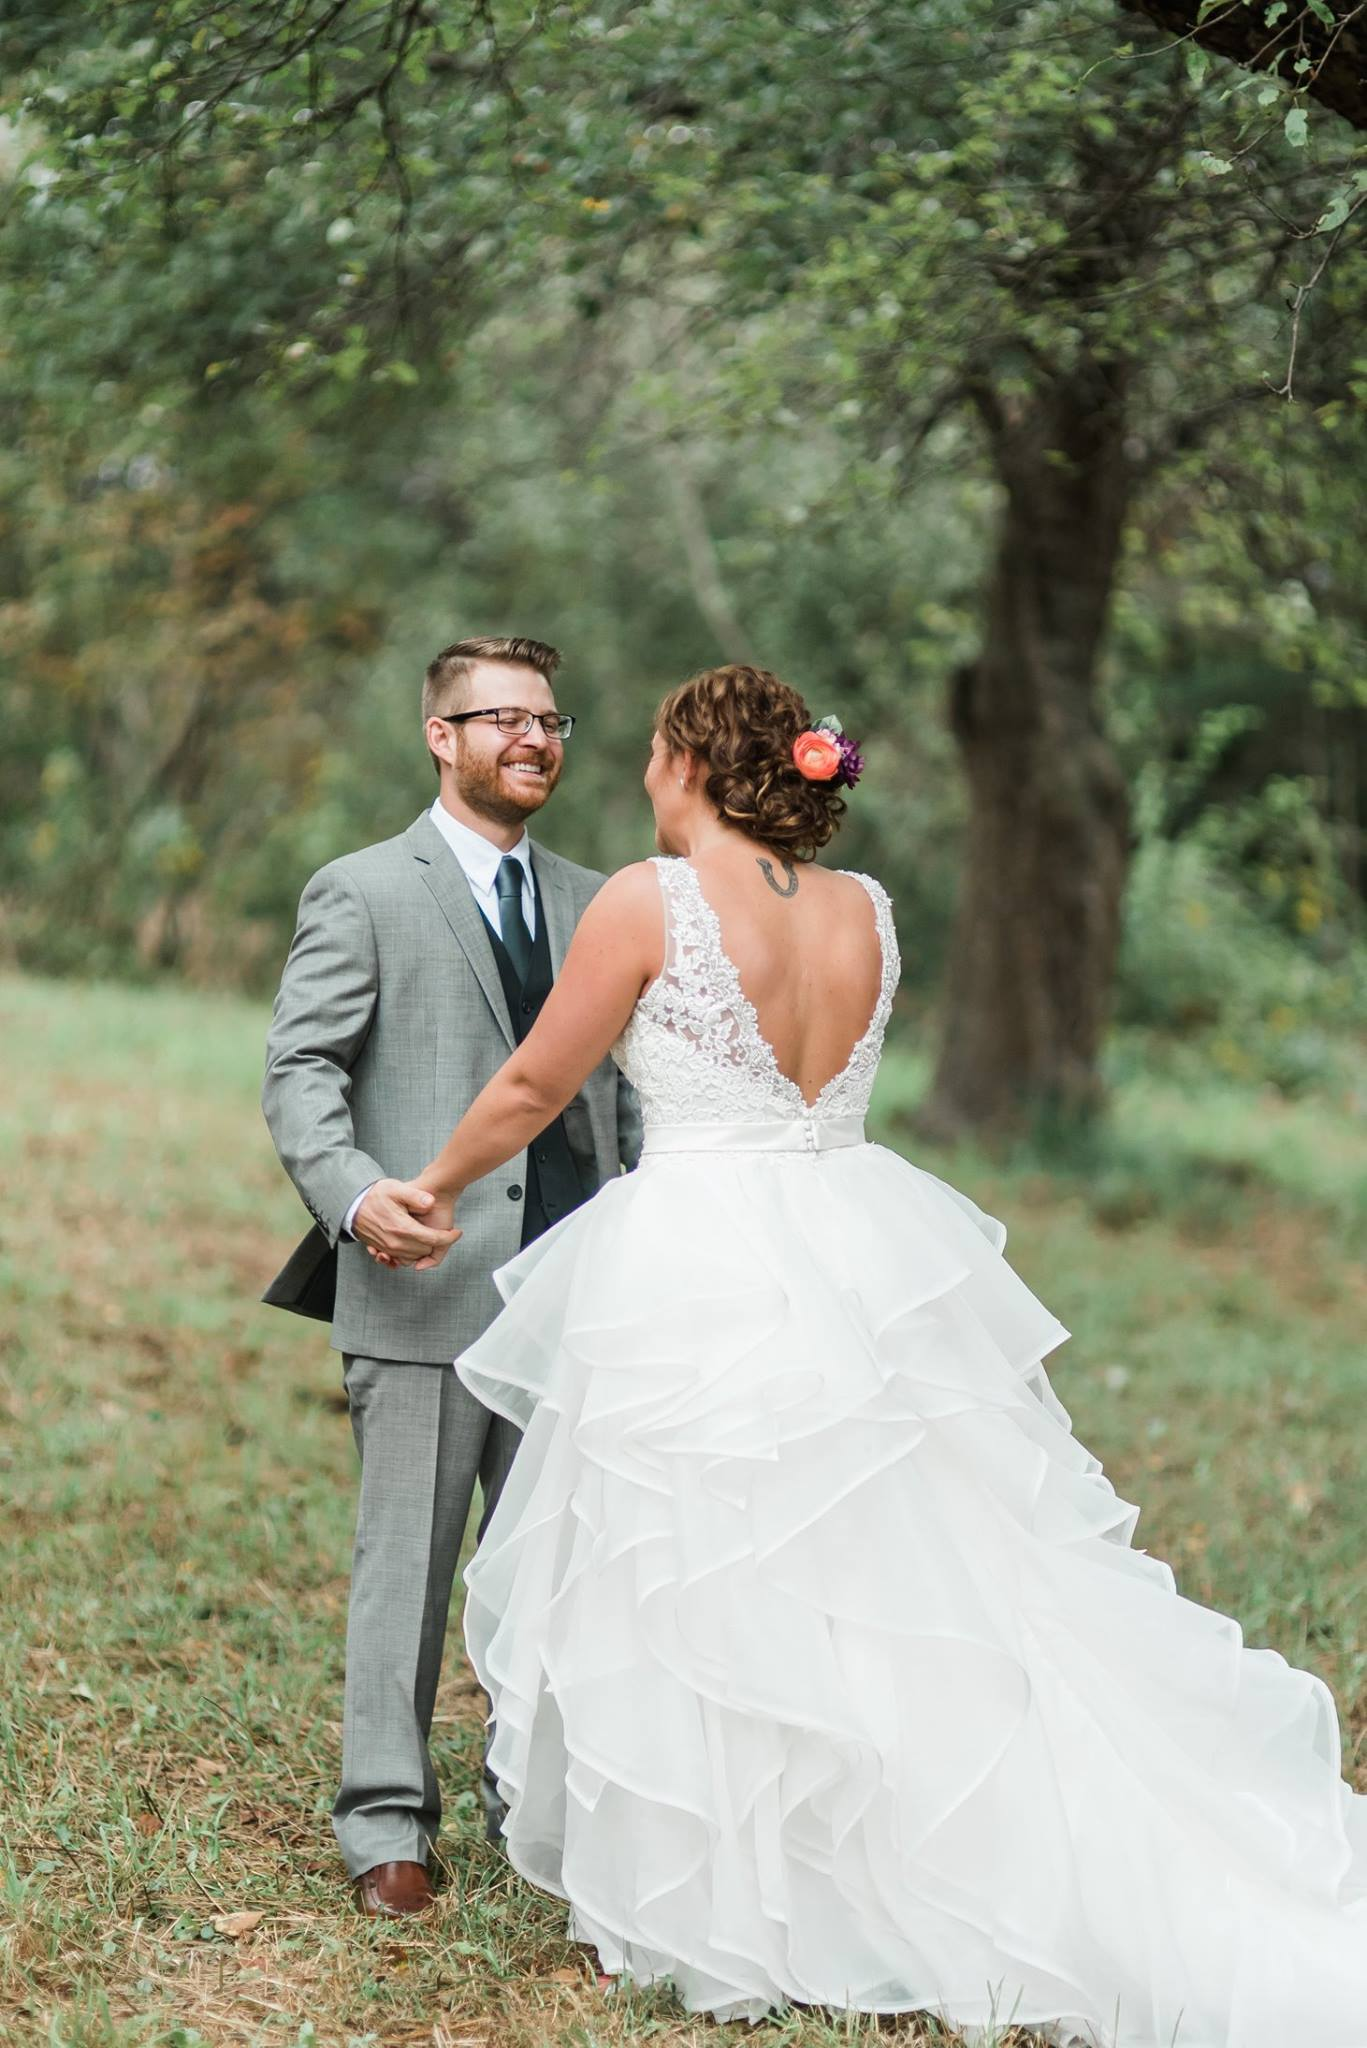 pennsylvania-backyard-wedding-love-diy-bohemian-romantic-colorful-0011.jpg